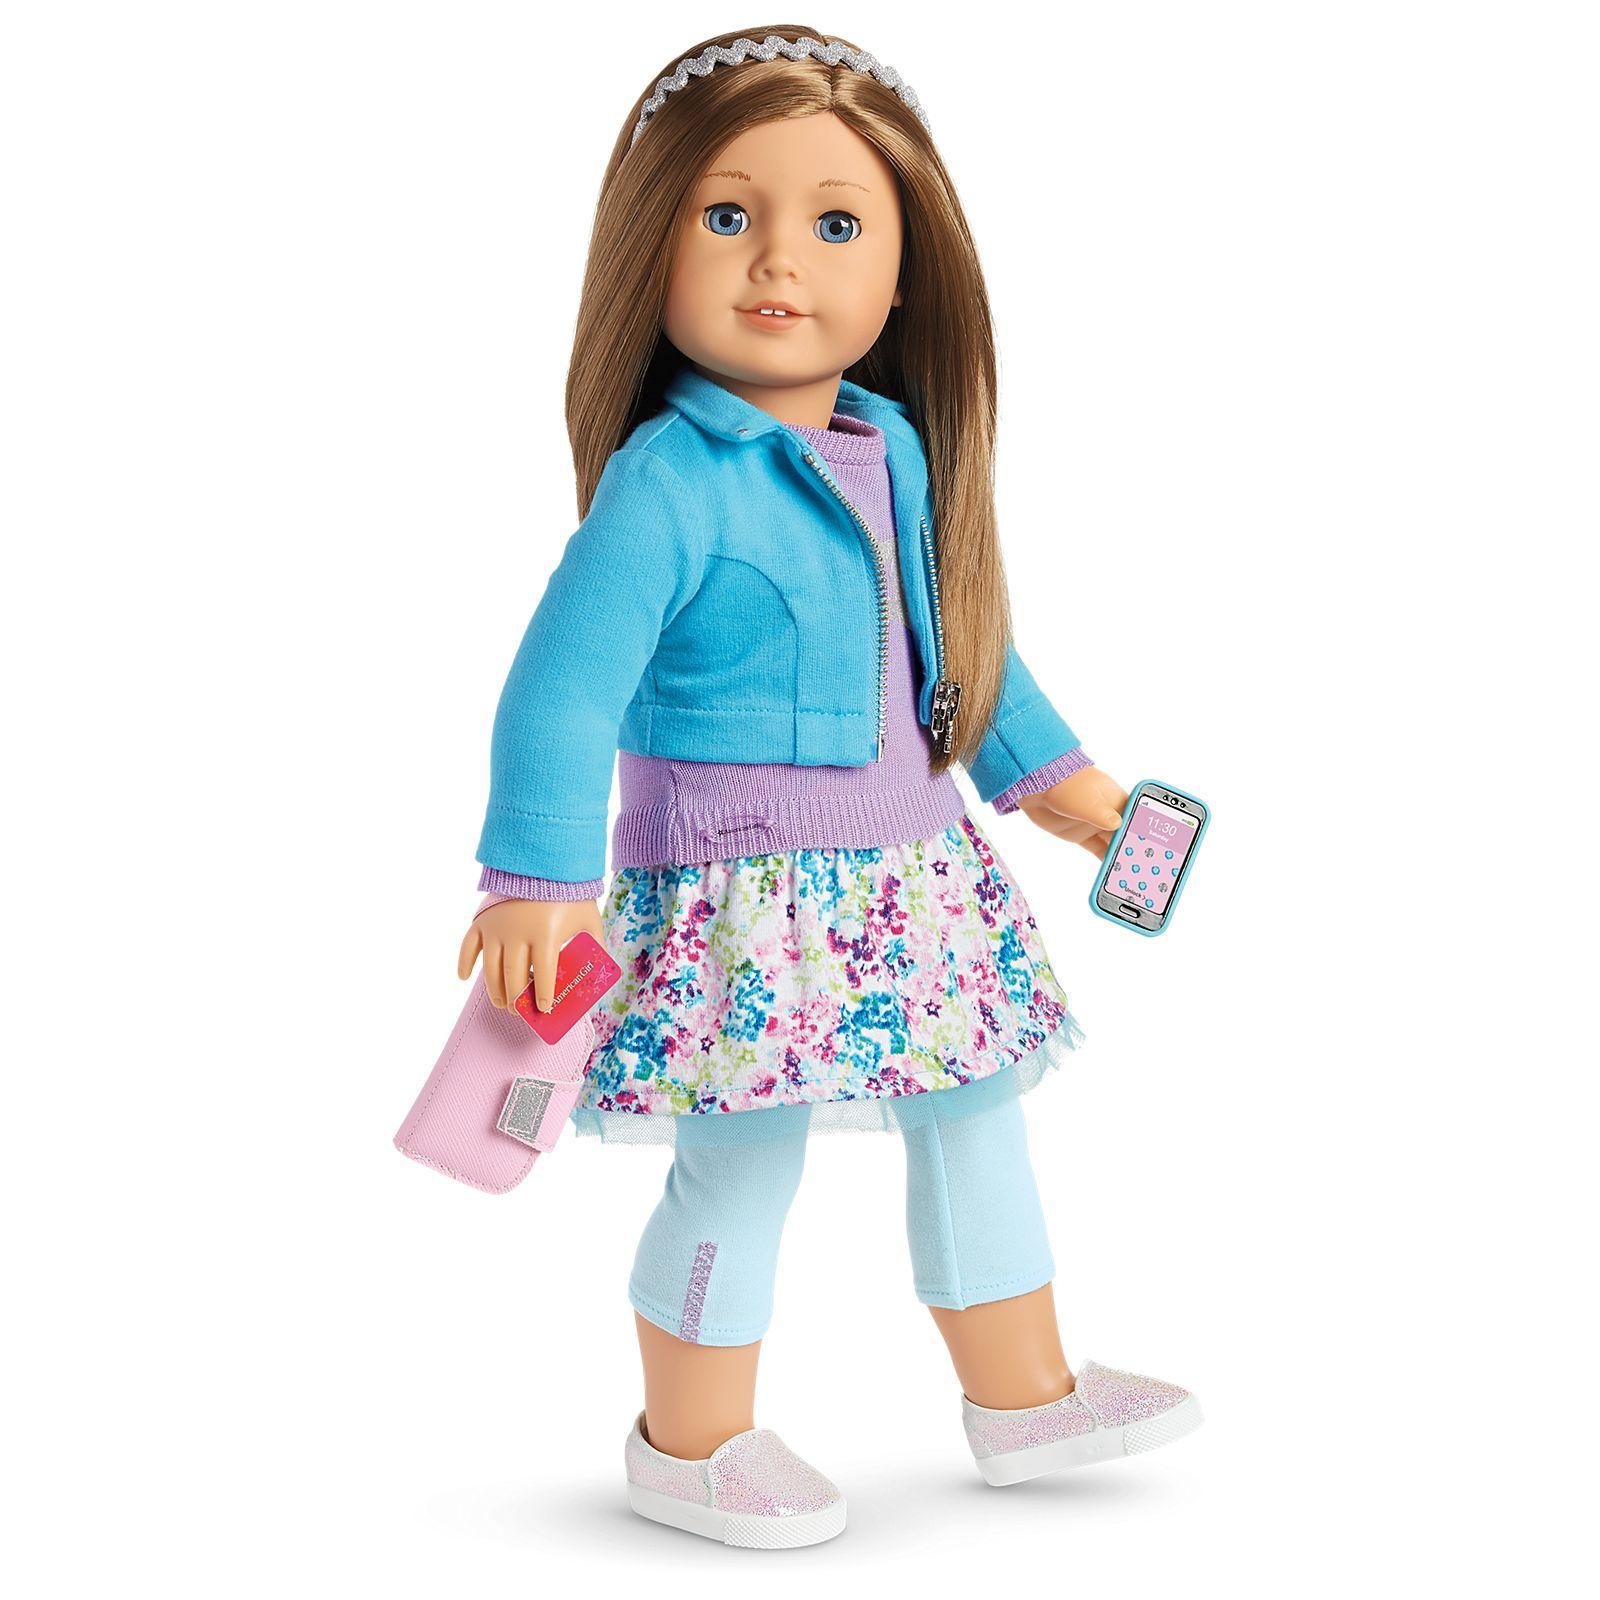 American Girl TRULY ME doll just like you long brown hair /& eyes light skin #59